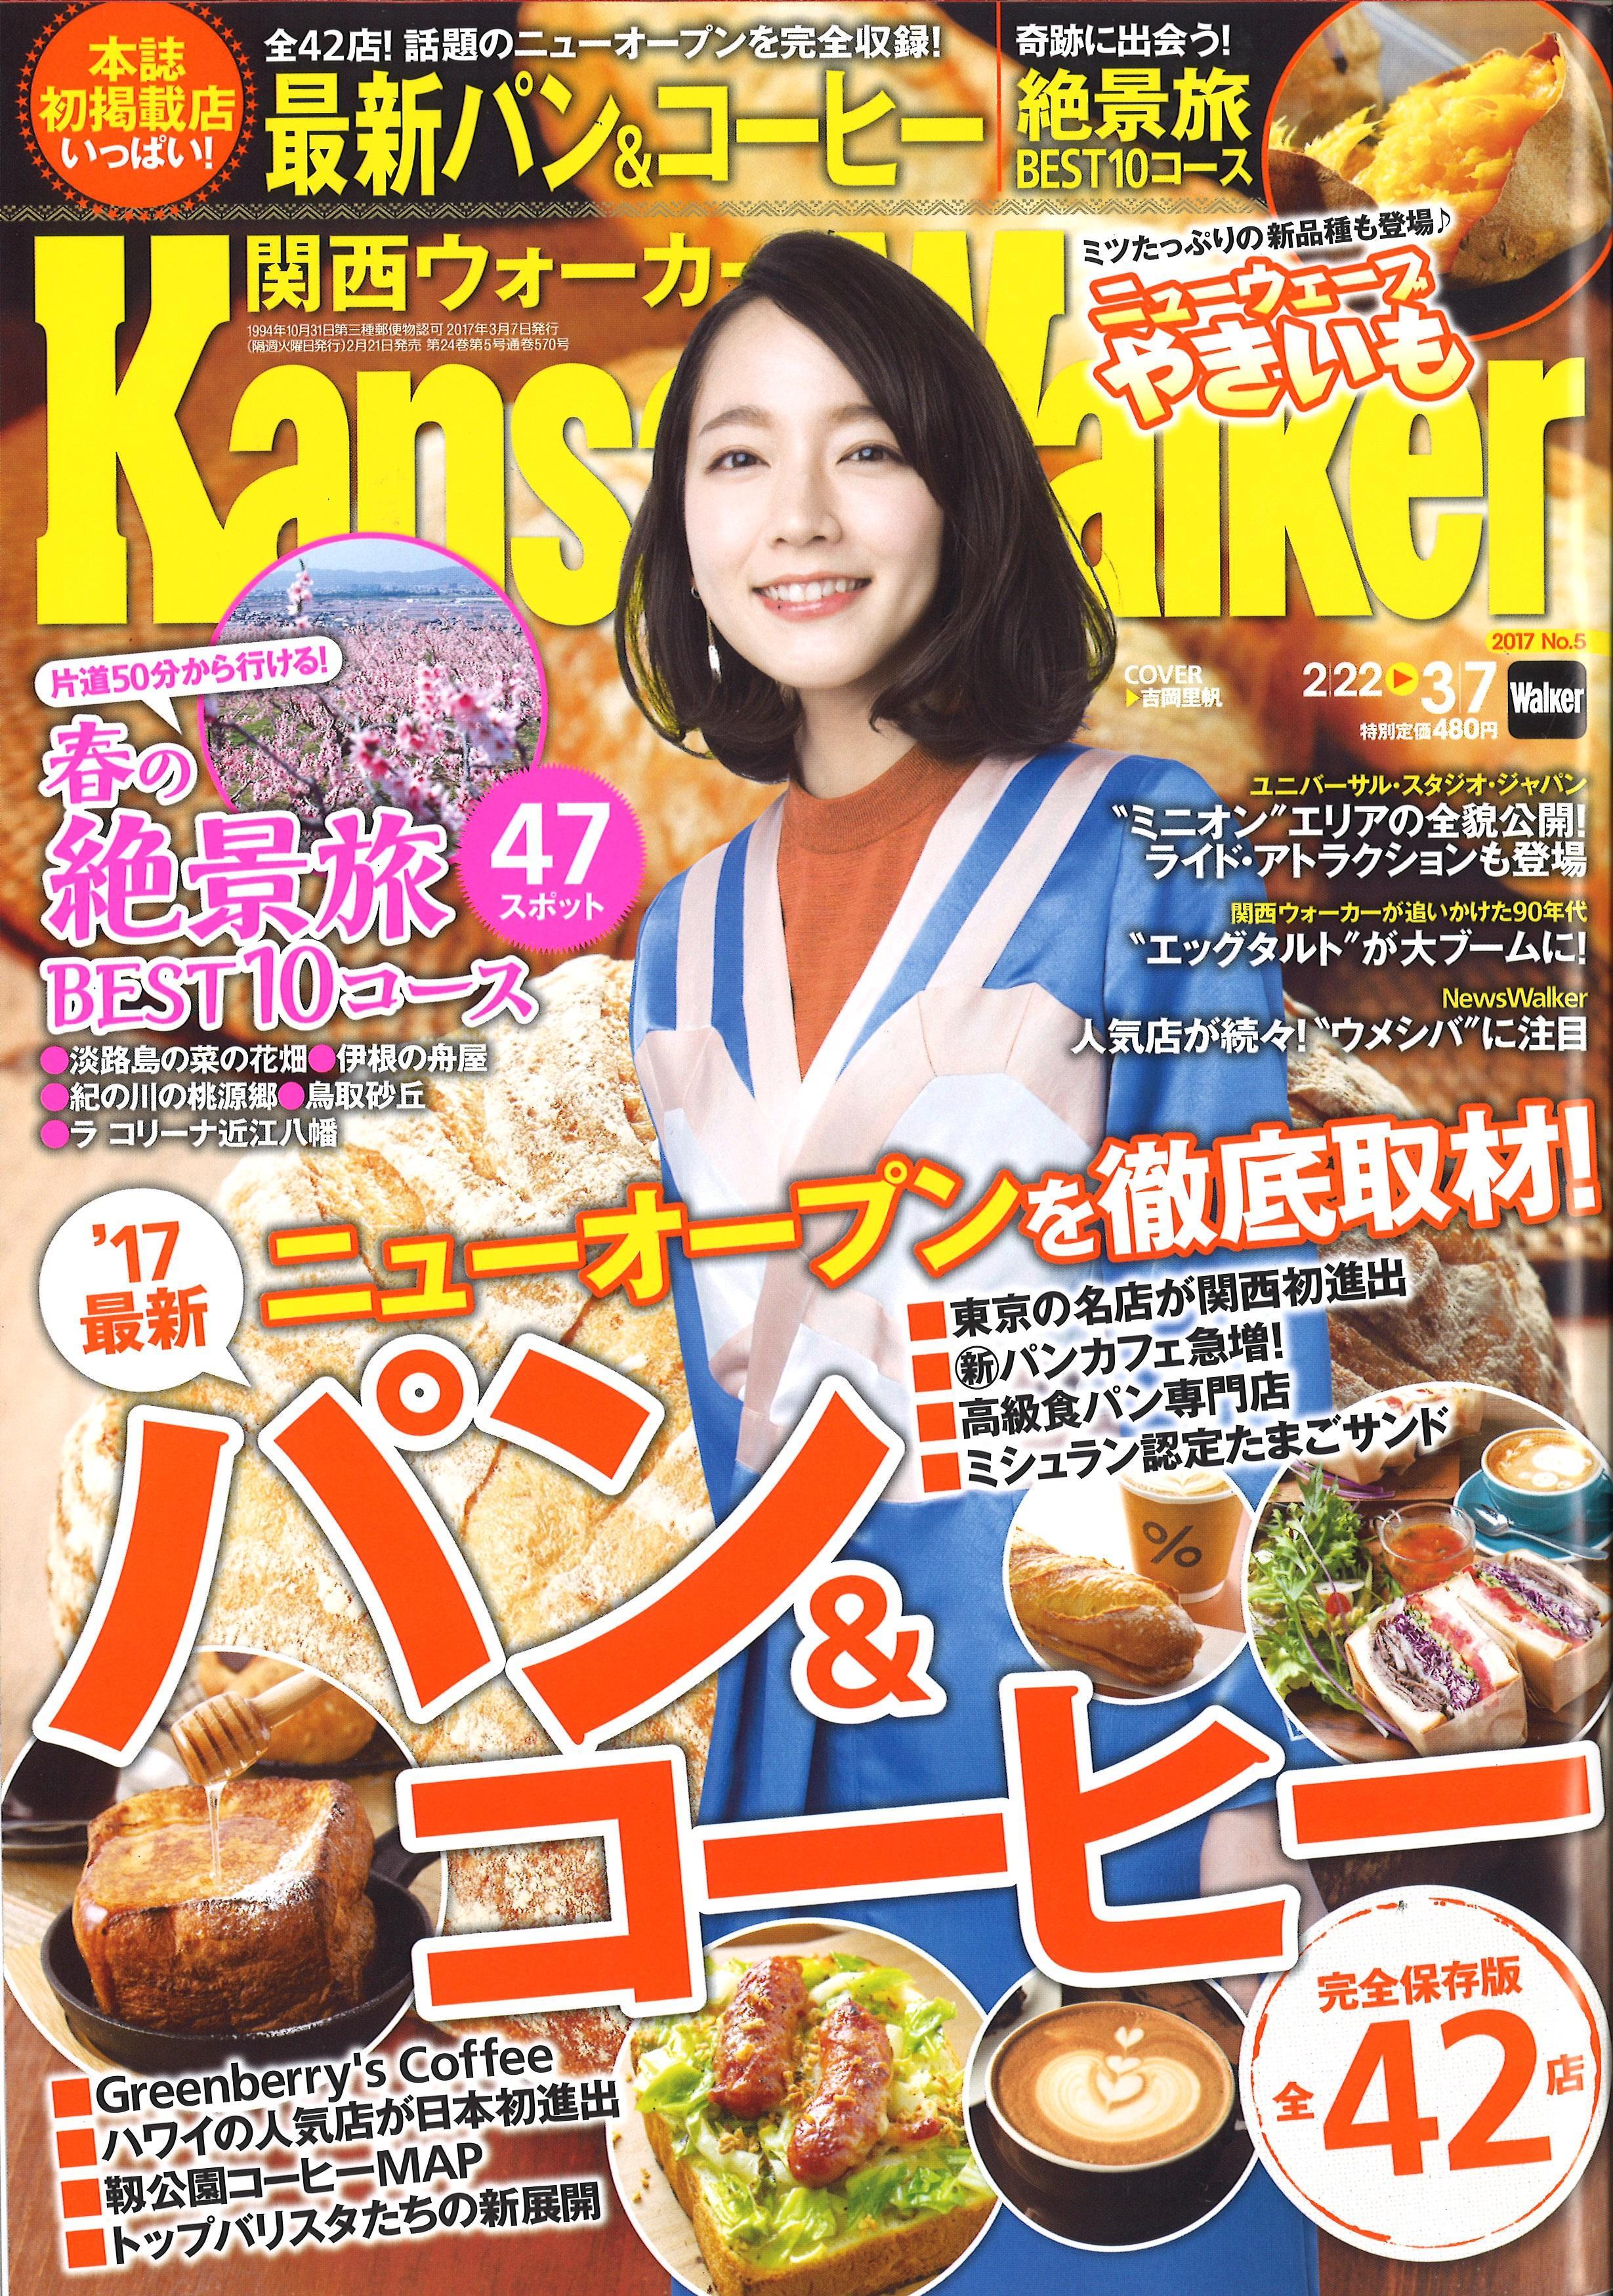 Kansai Walker 2/22号に掲載されました